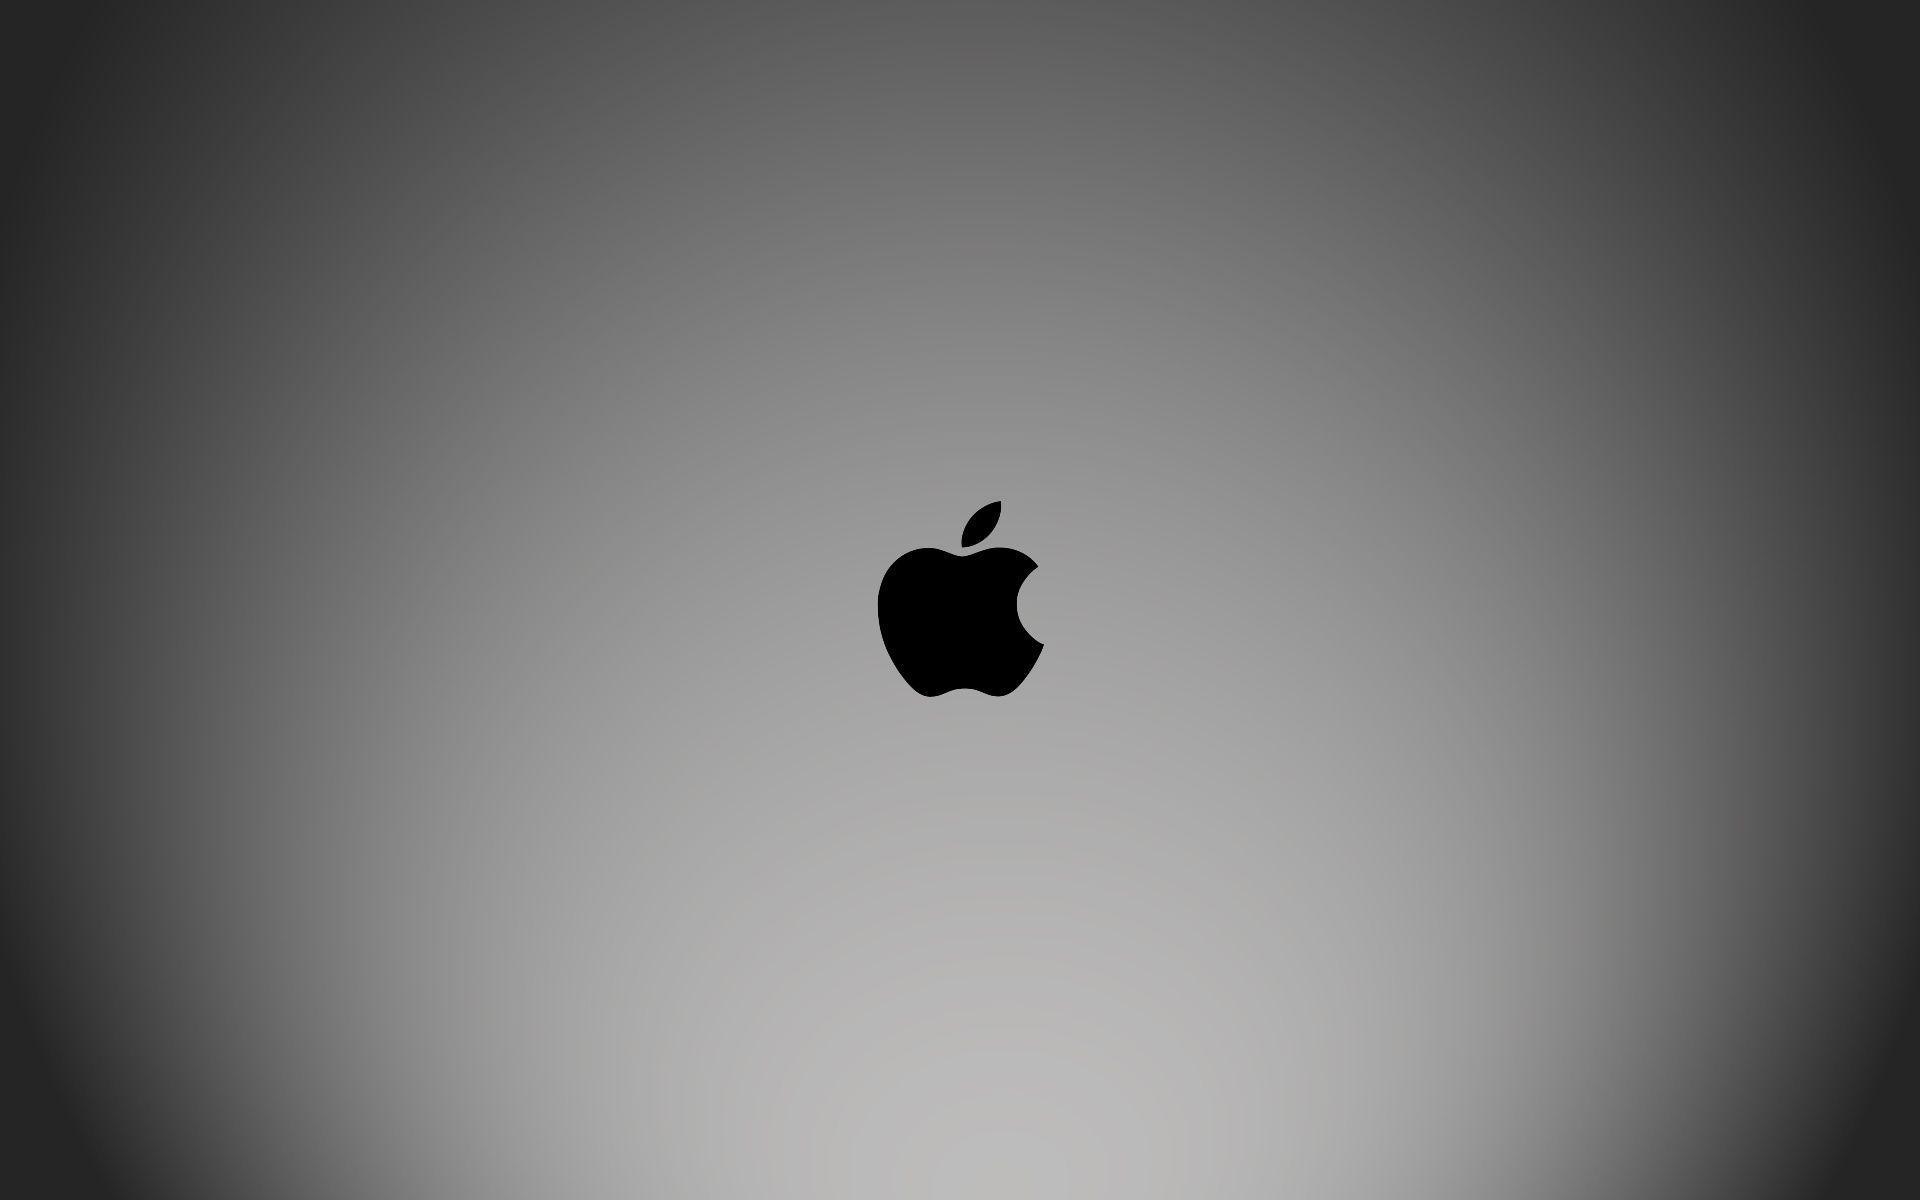 Unduh 500+ Wallpaper Apple Hd White  Terbaik